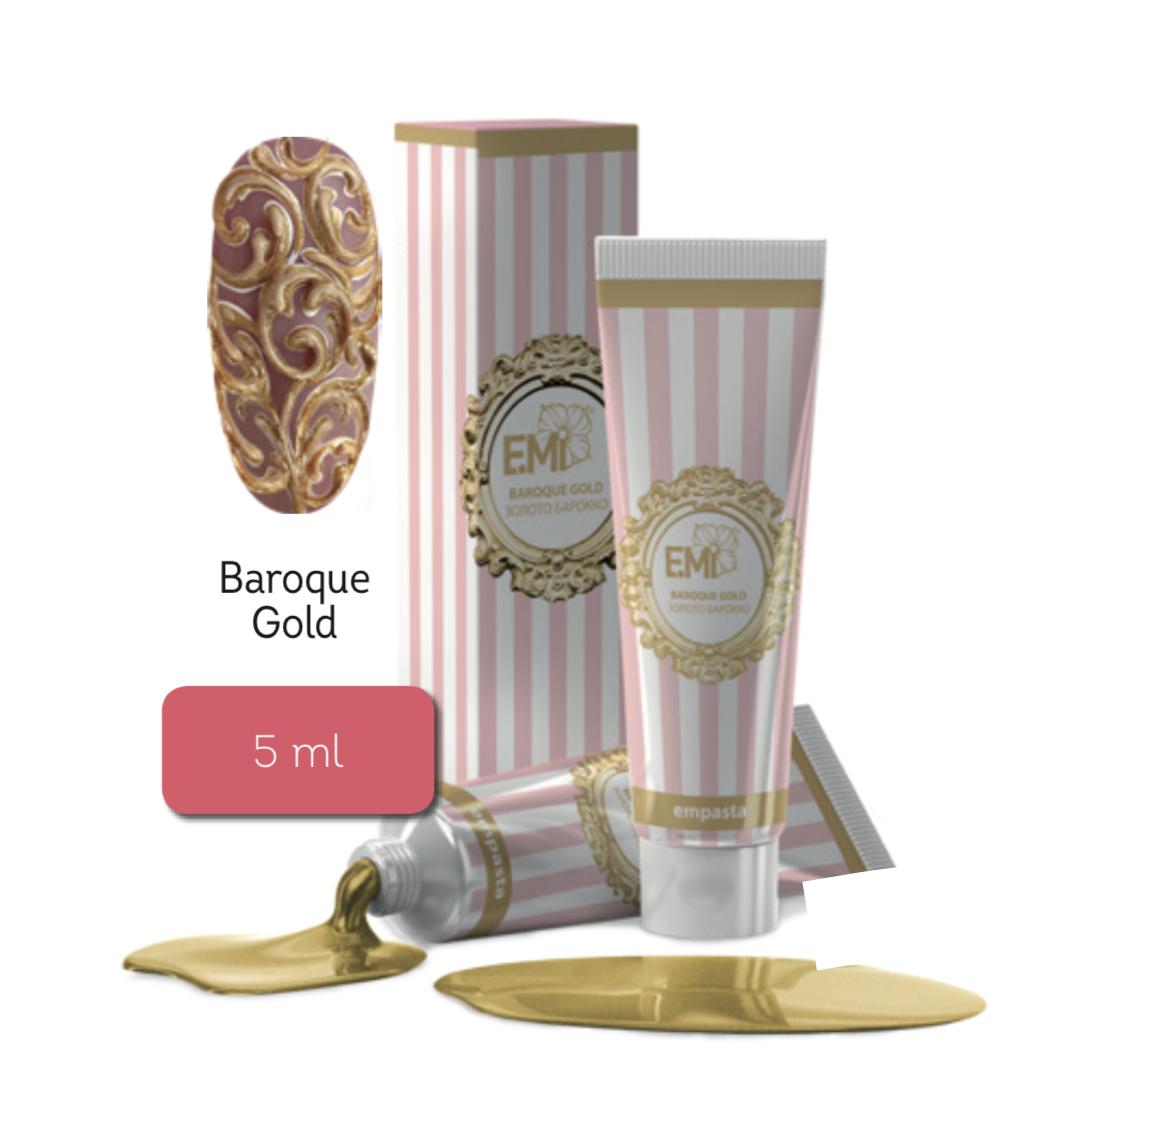 EMPASTA Baroque Gold, 5 ml.